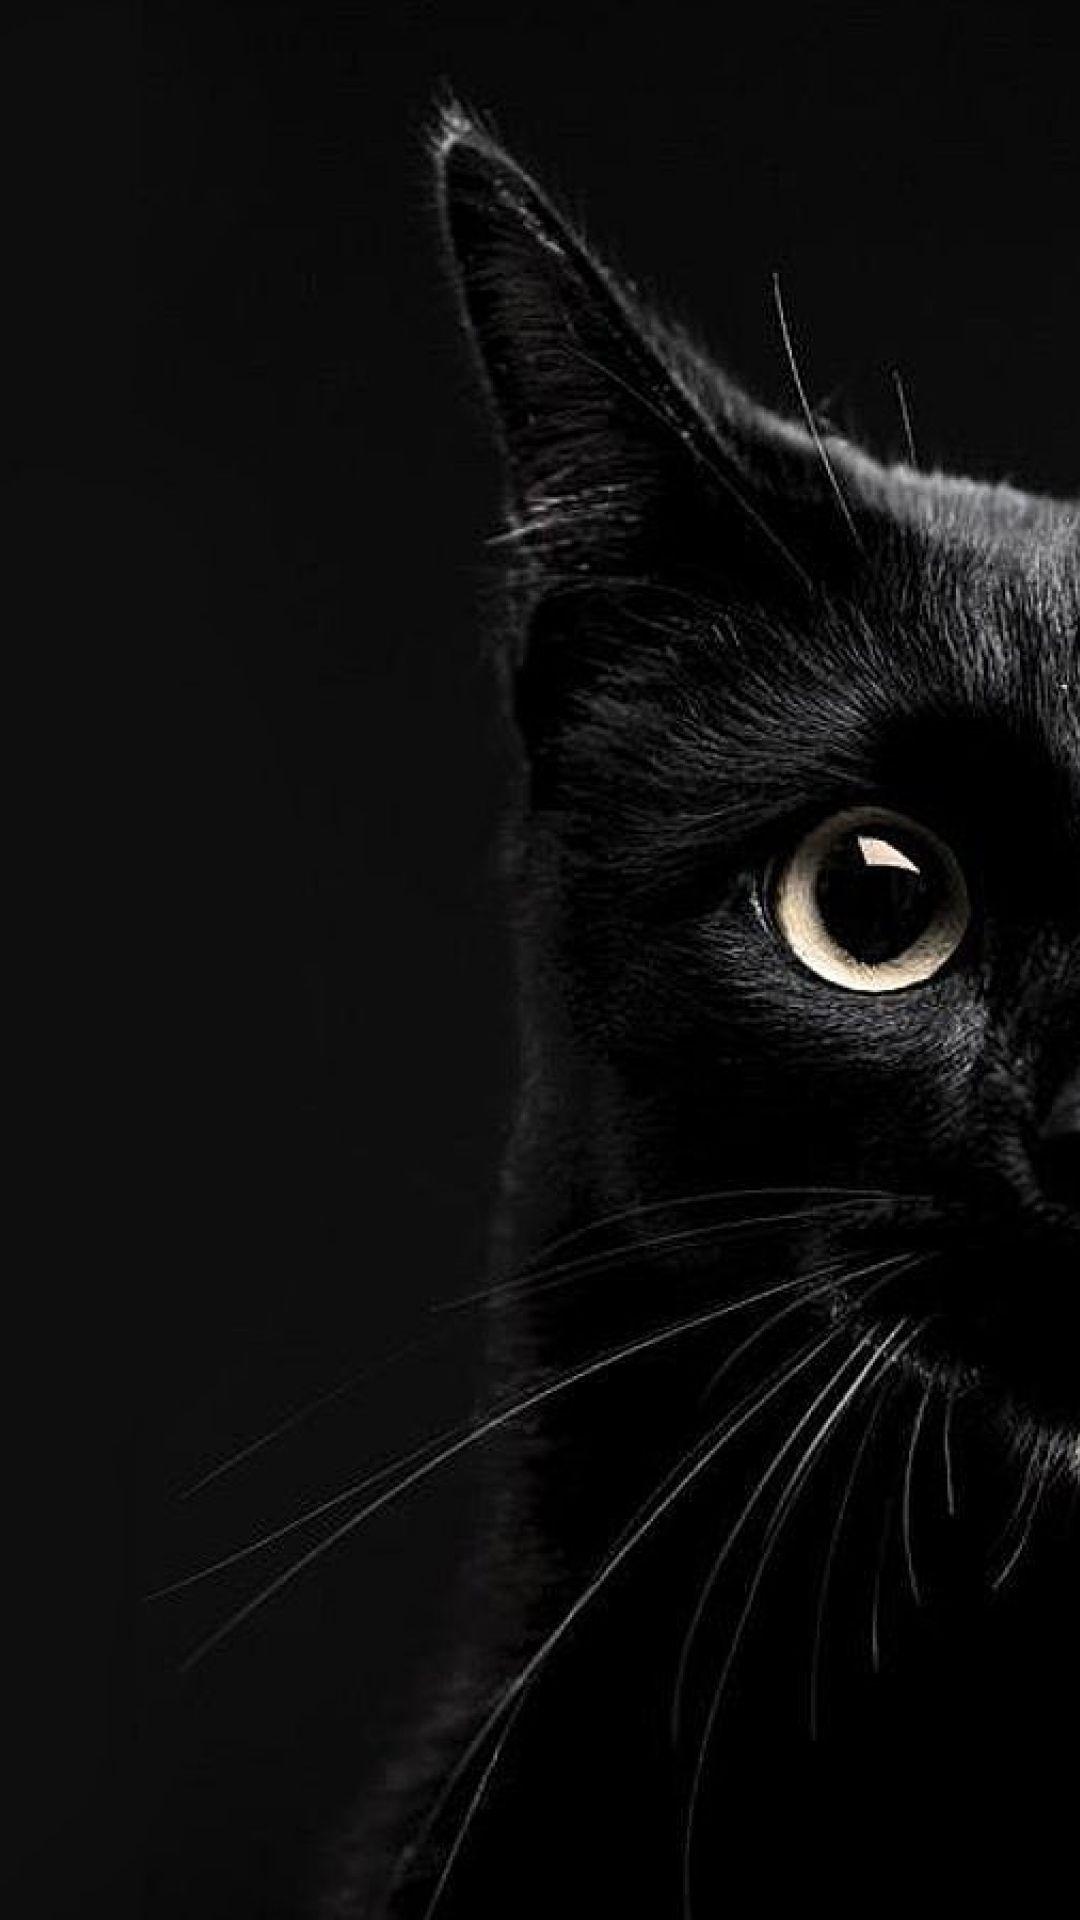 Black Cat Wallpaper Hd Iphone In 2020 Iphone Wallpaper Cat Cat Background Cute Cat Wallpaper